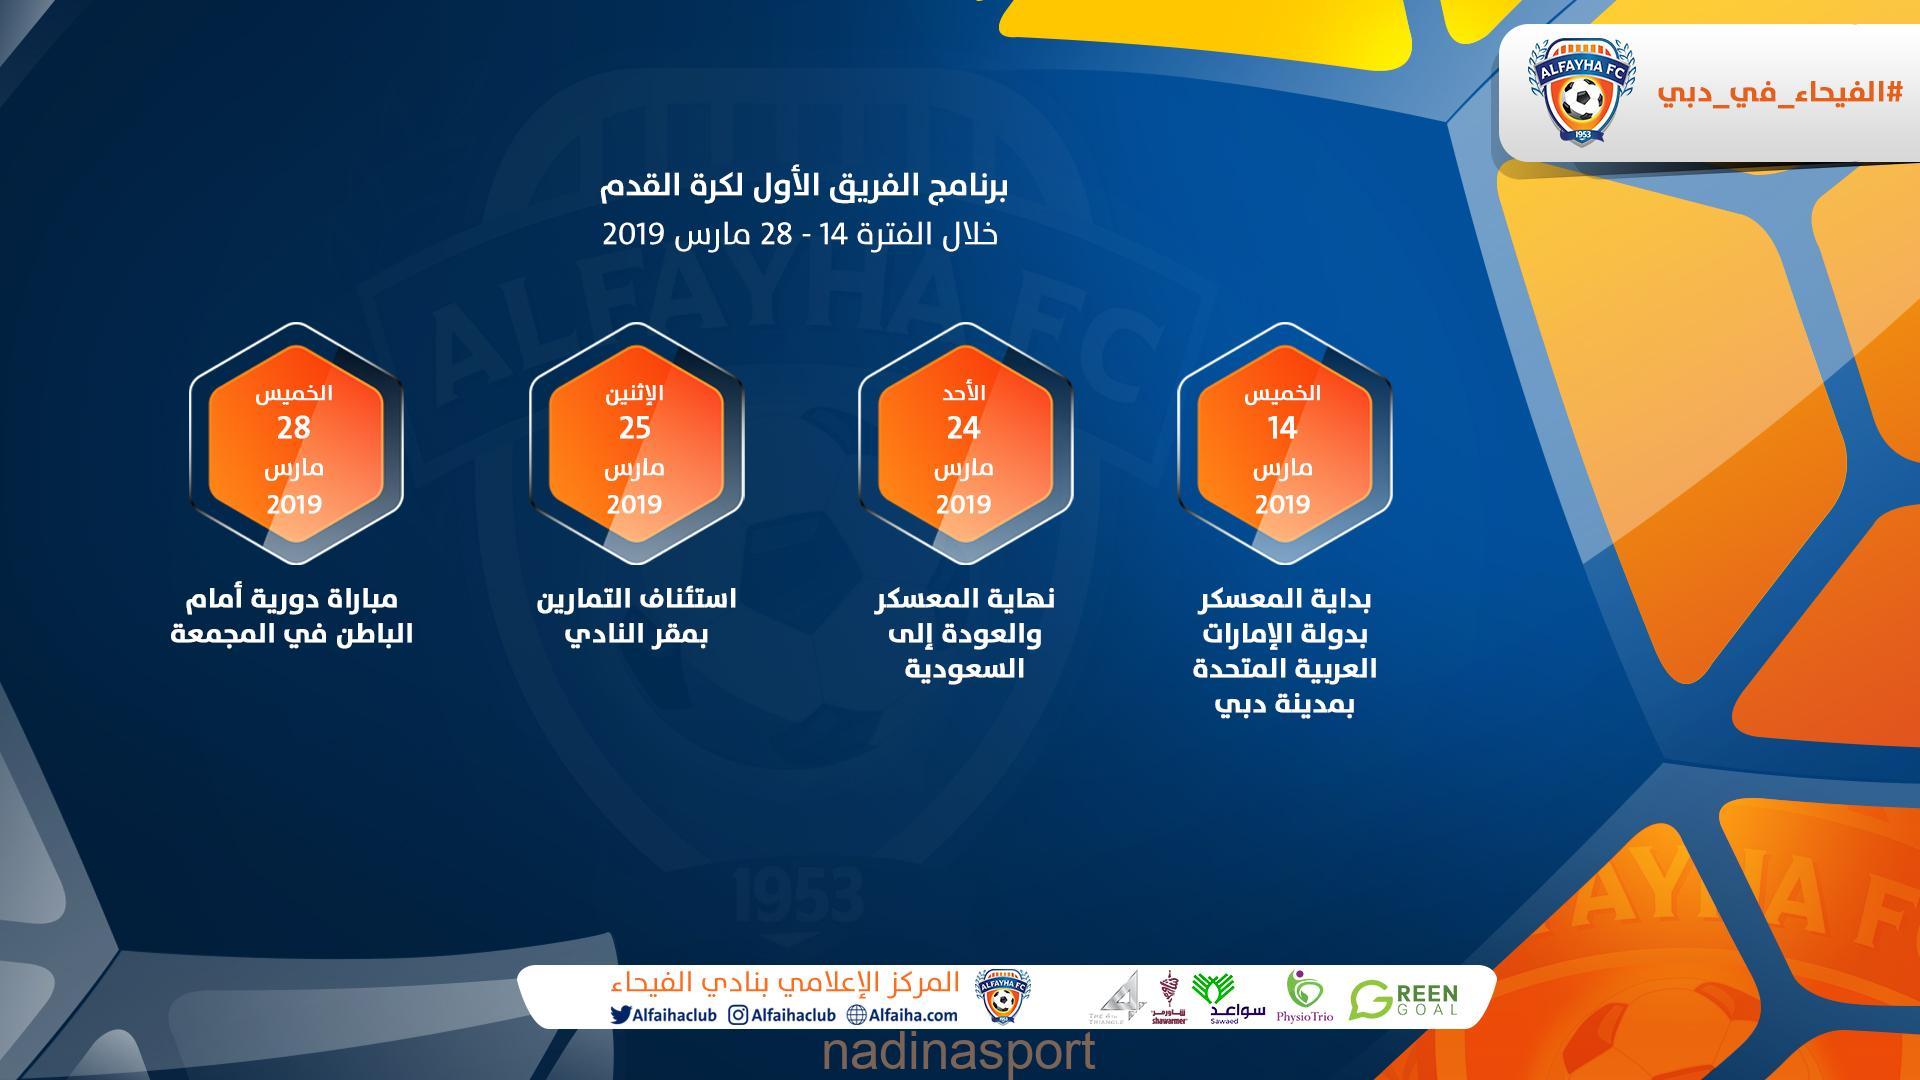 برنامج معسكر دبي 2019